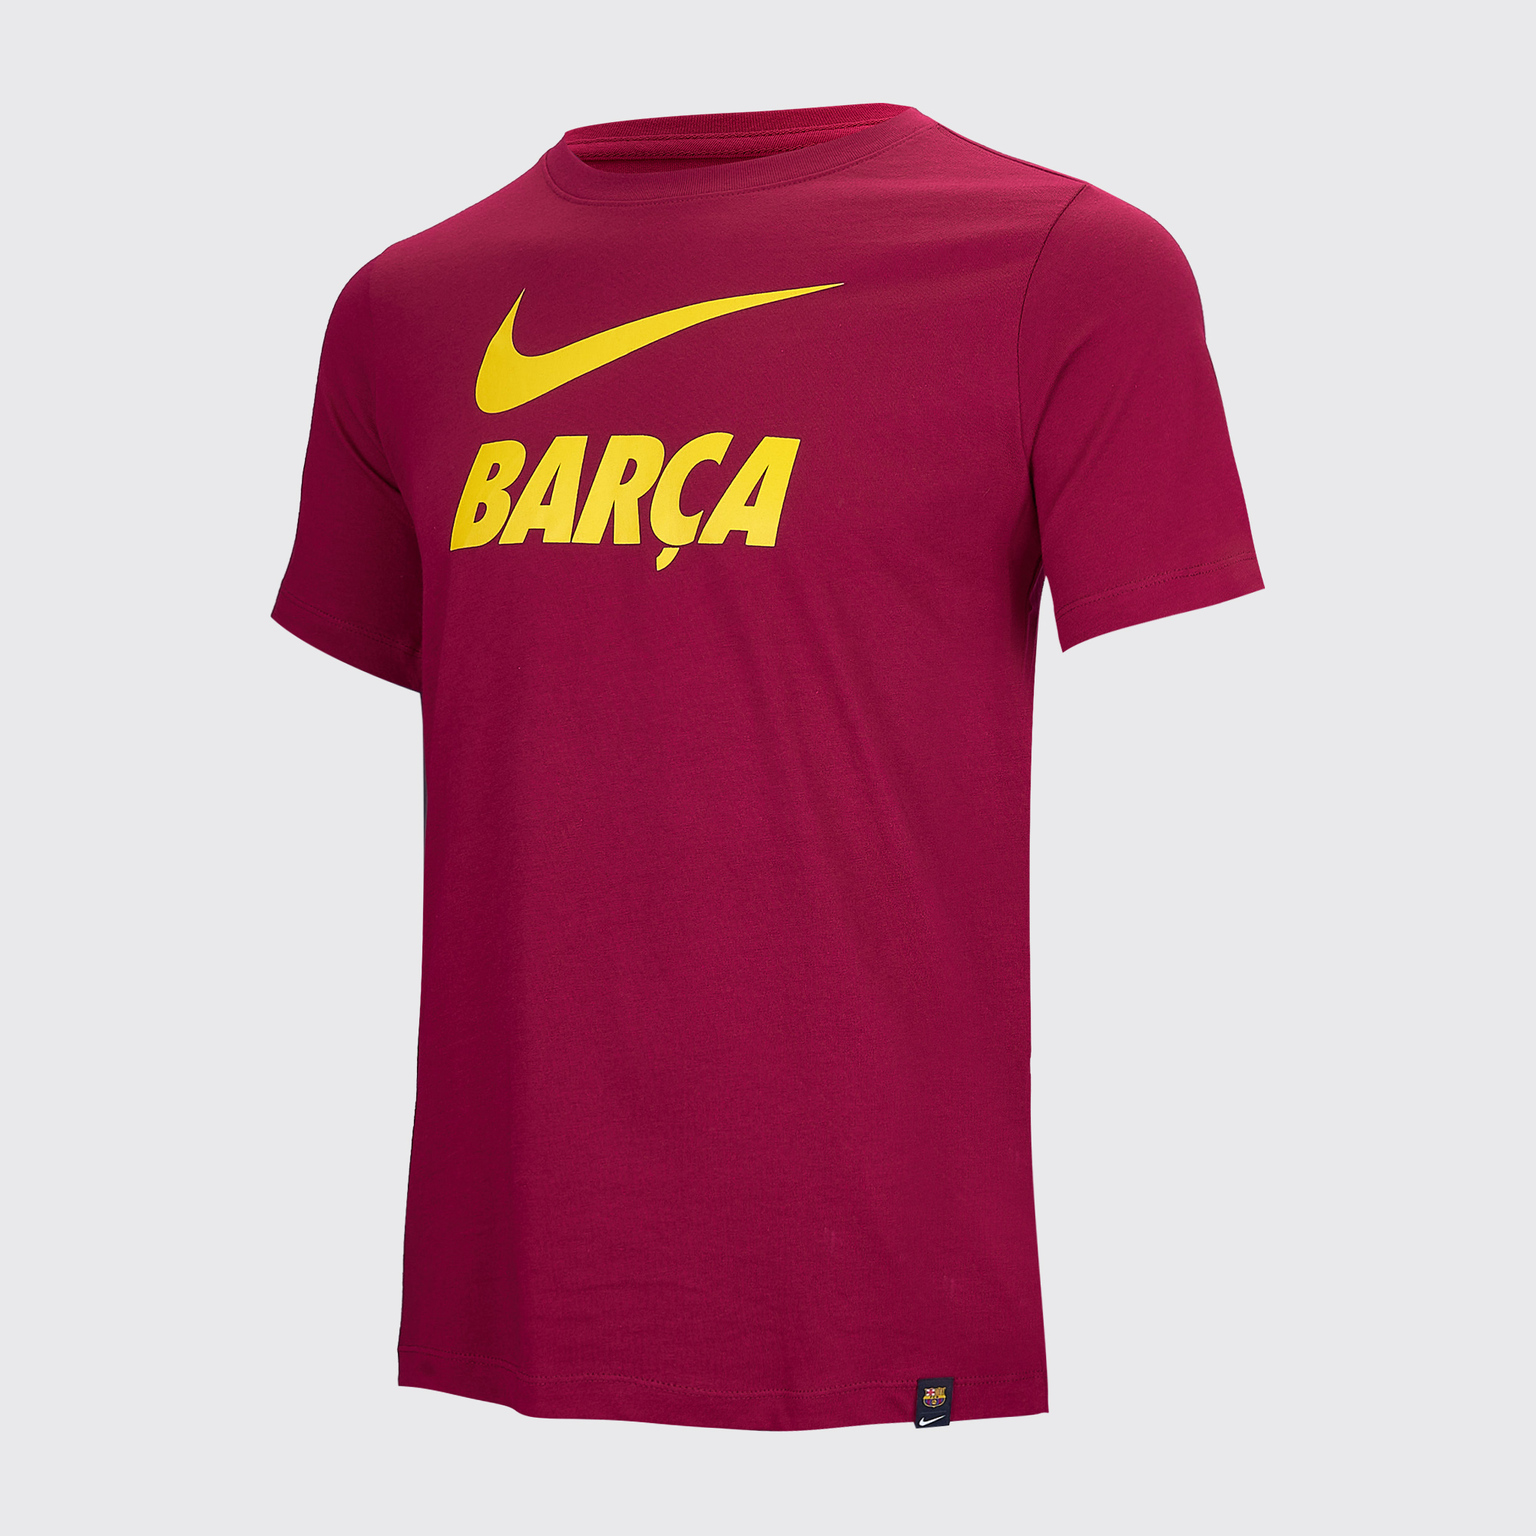 Футболка хлопковая подростковая Nike Barcelona сезон 2020/21 футболка подростковая nike team club blend tee 658494 451